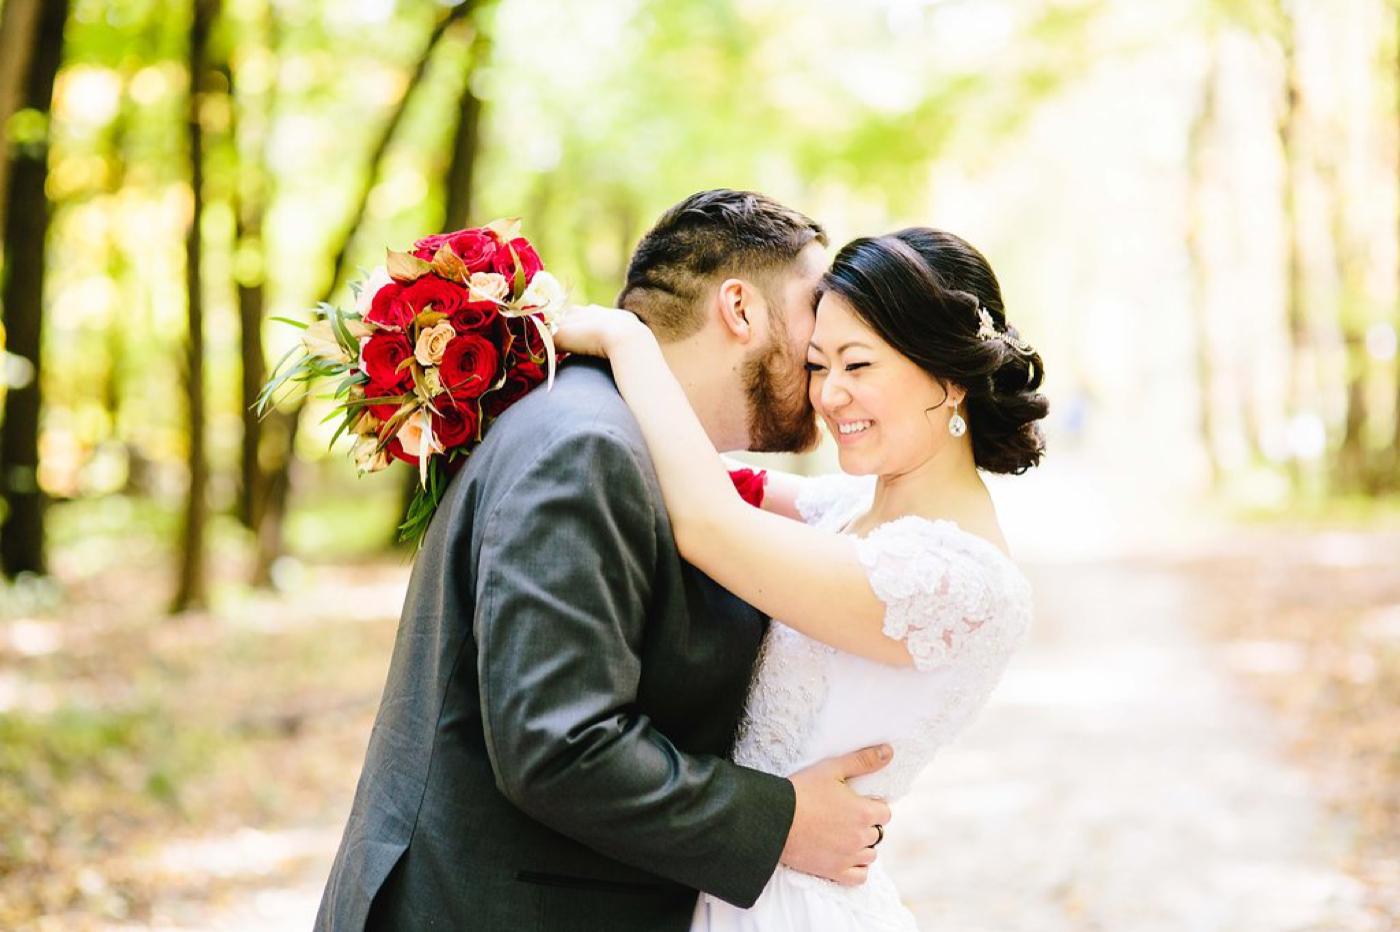 chicago-fine-art-wedding-photography-bolotin13